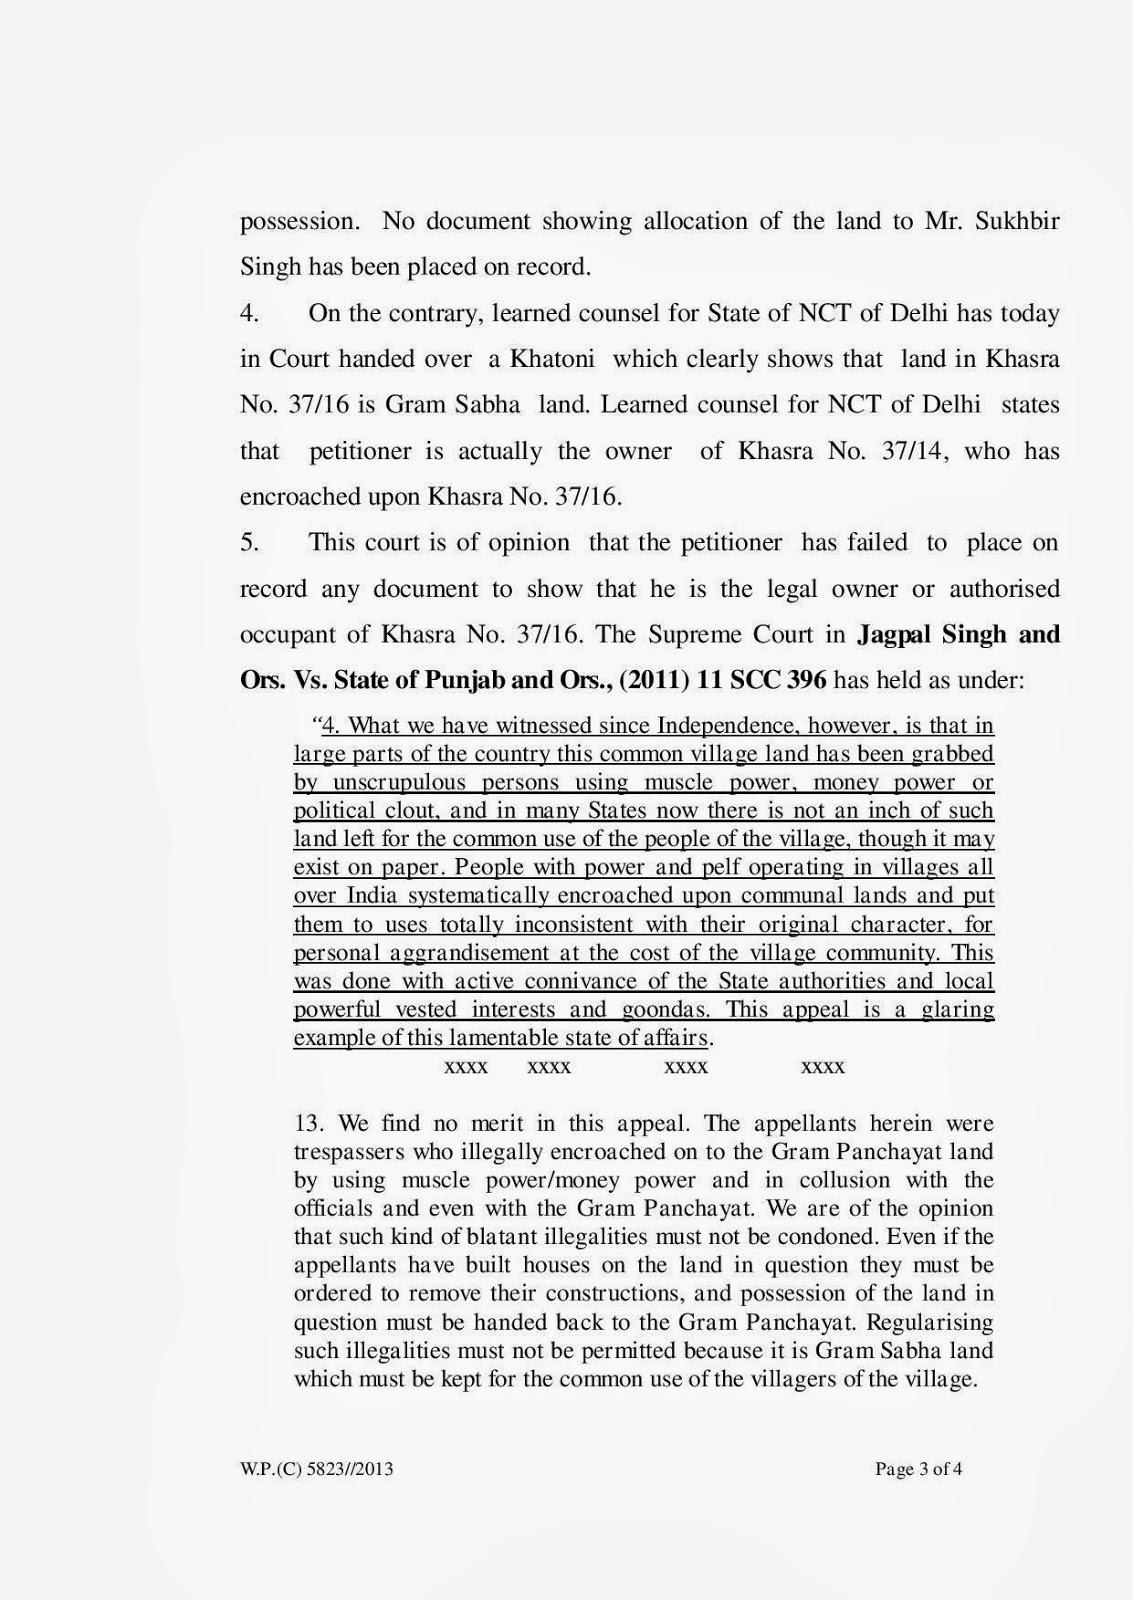 ram rahim case judgment pdf